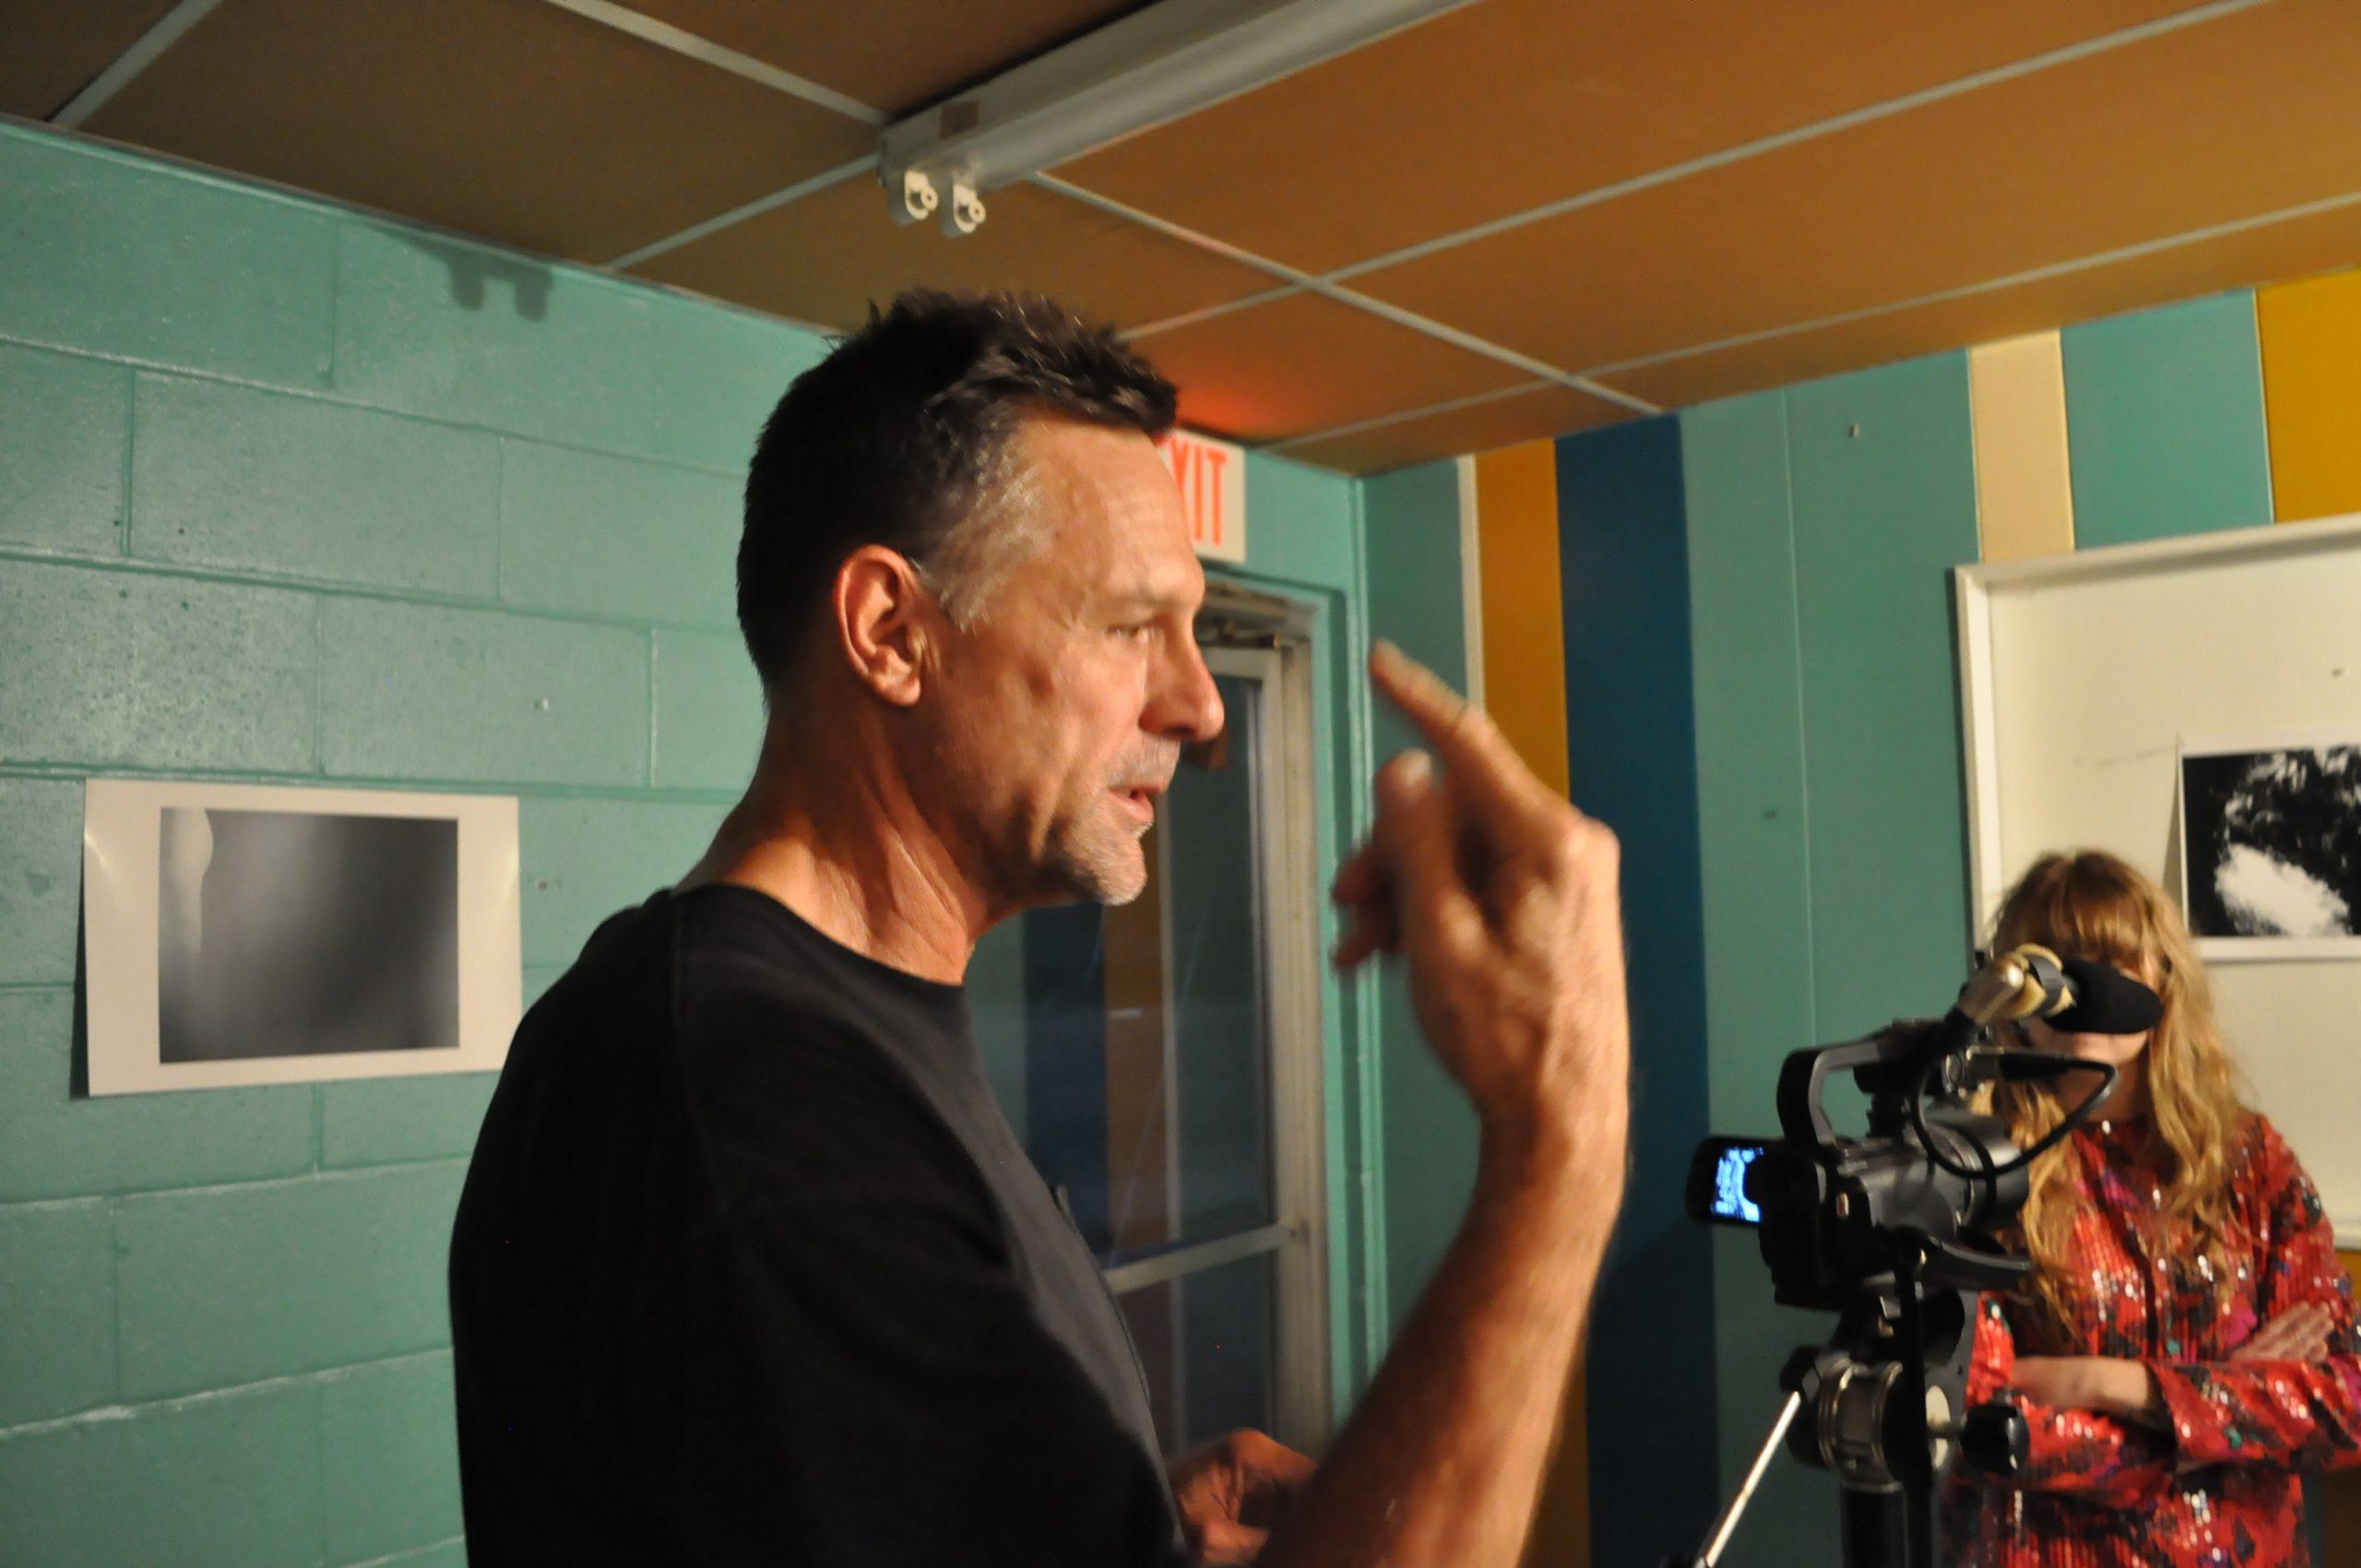 Director Michael Berrier. Photo by Jacob Coltrane Burris.